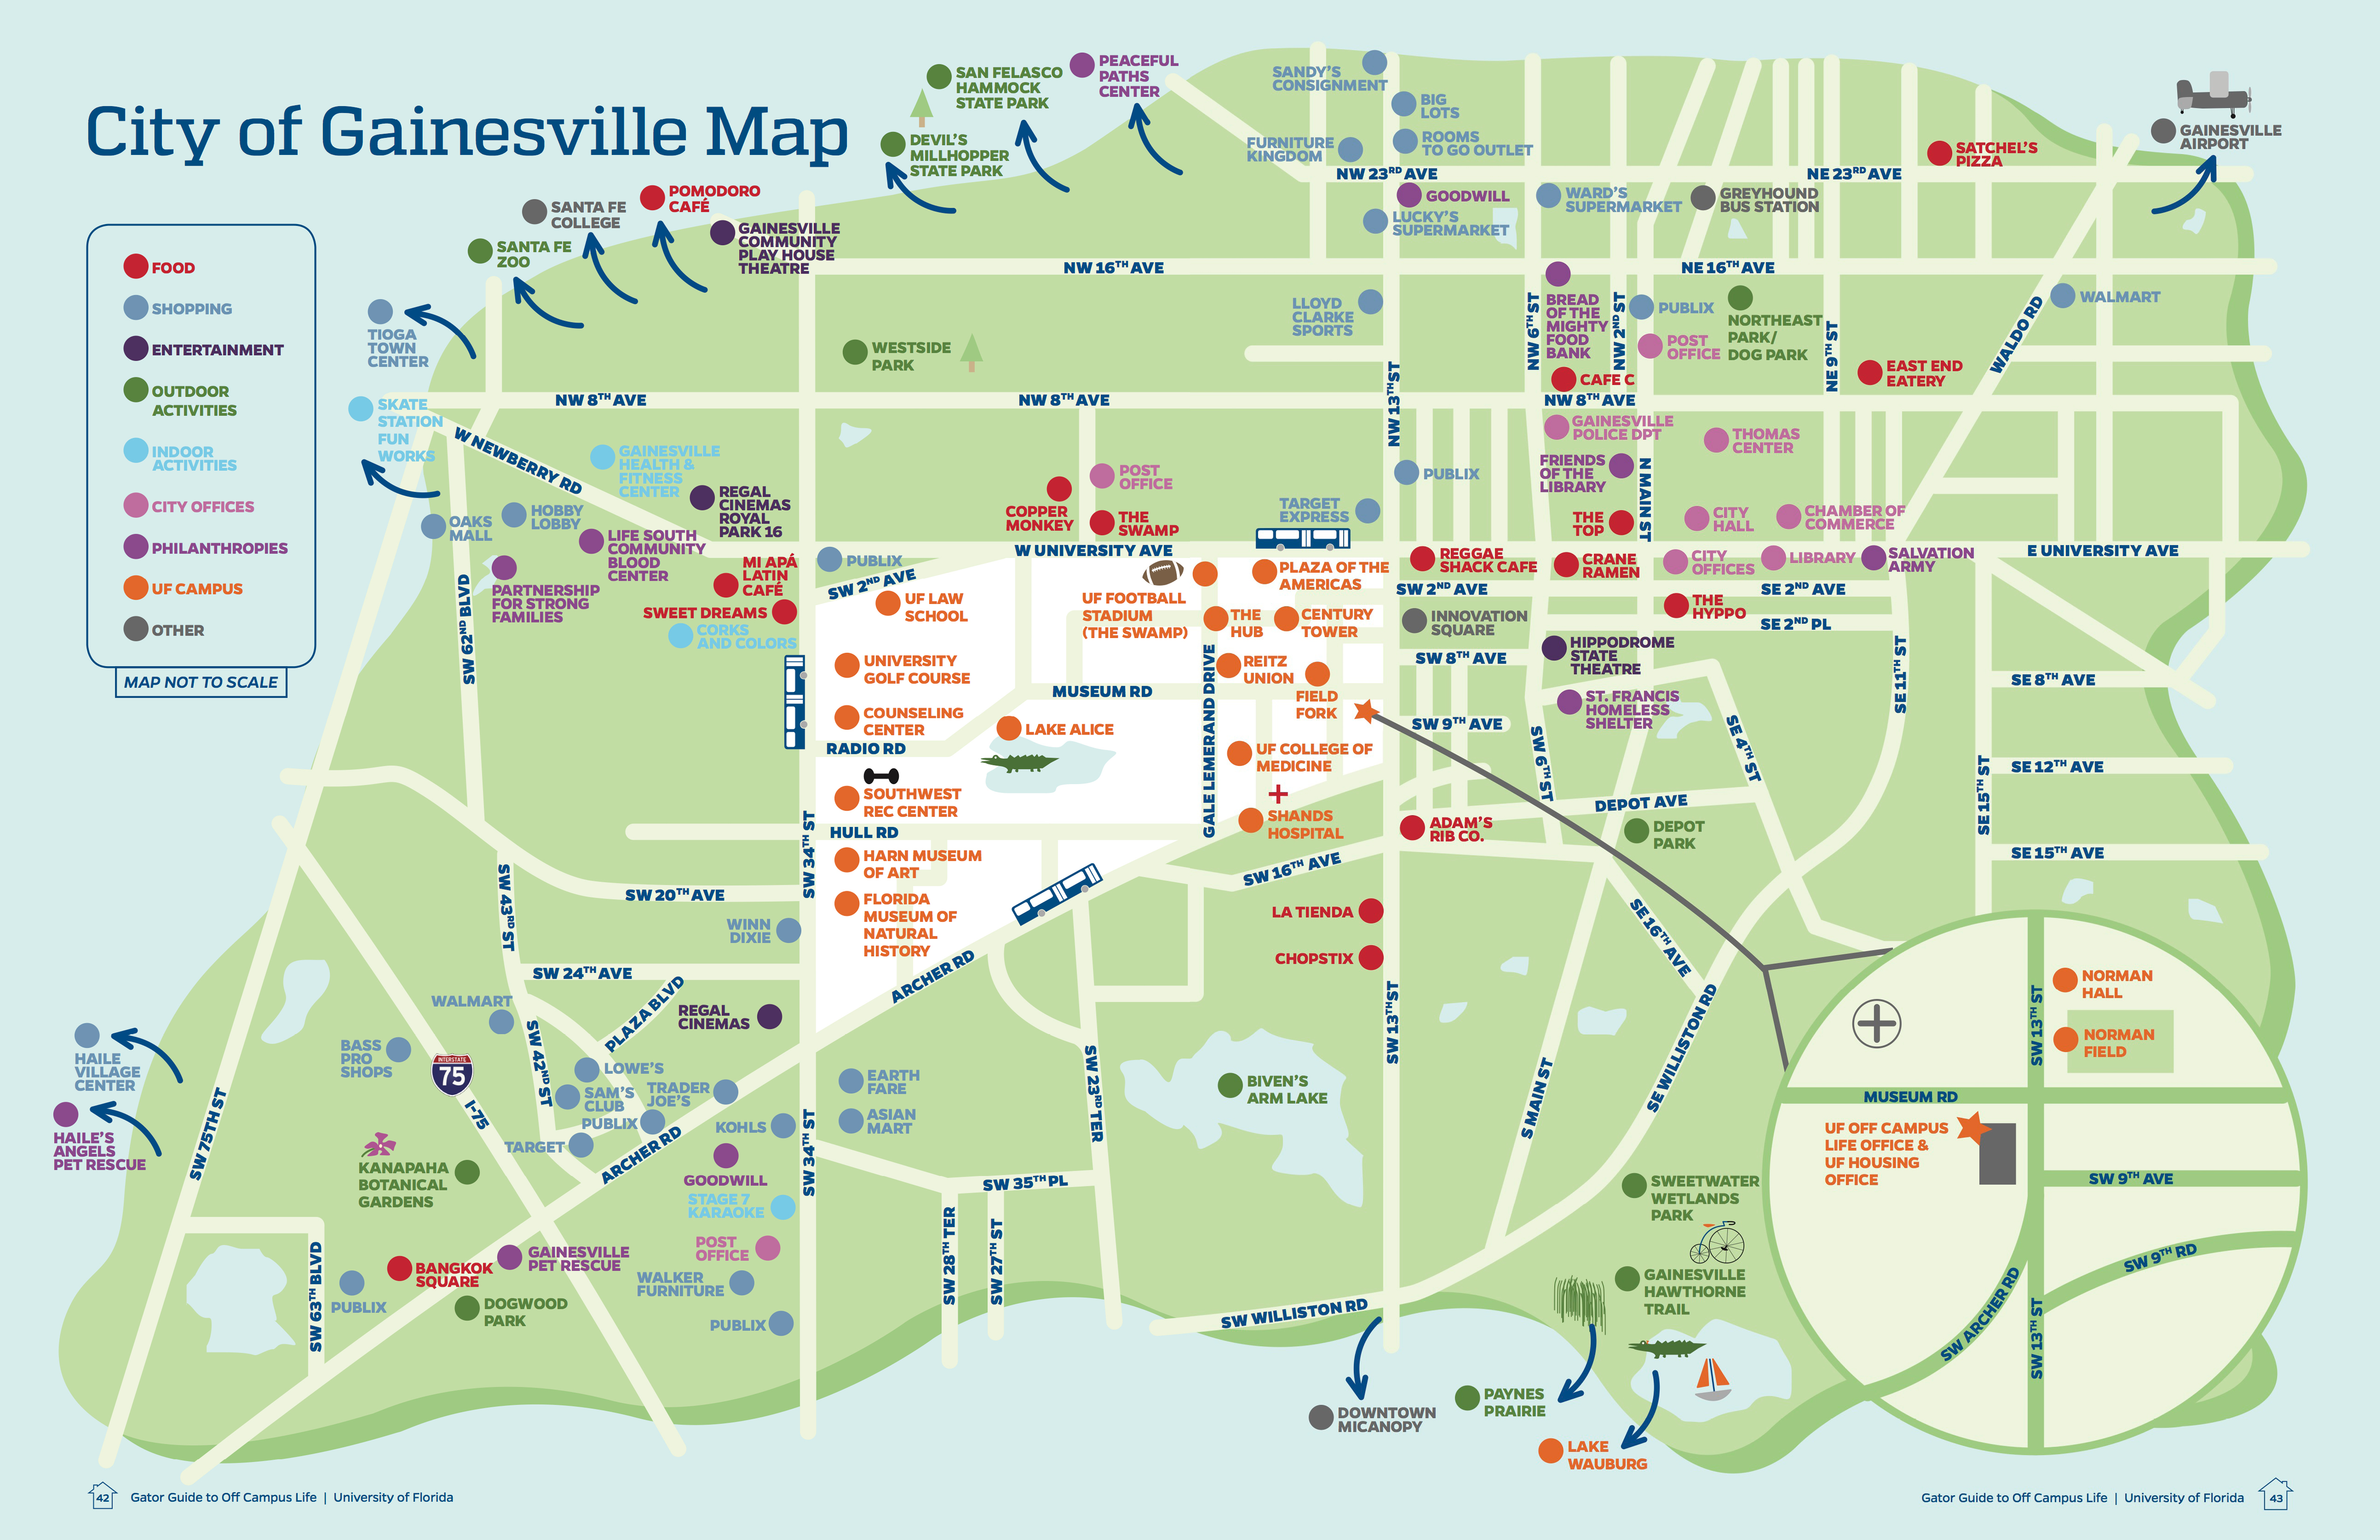 University Of Florida Map University of Florida Off Campus Life   christina singer